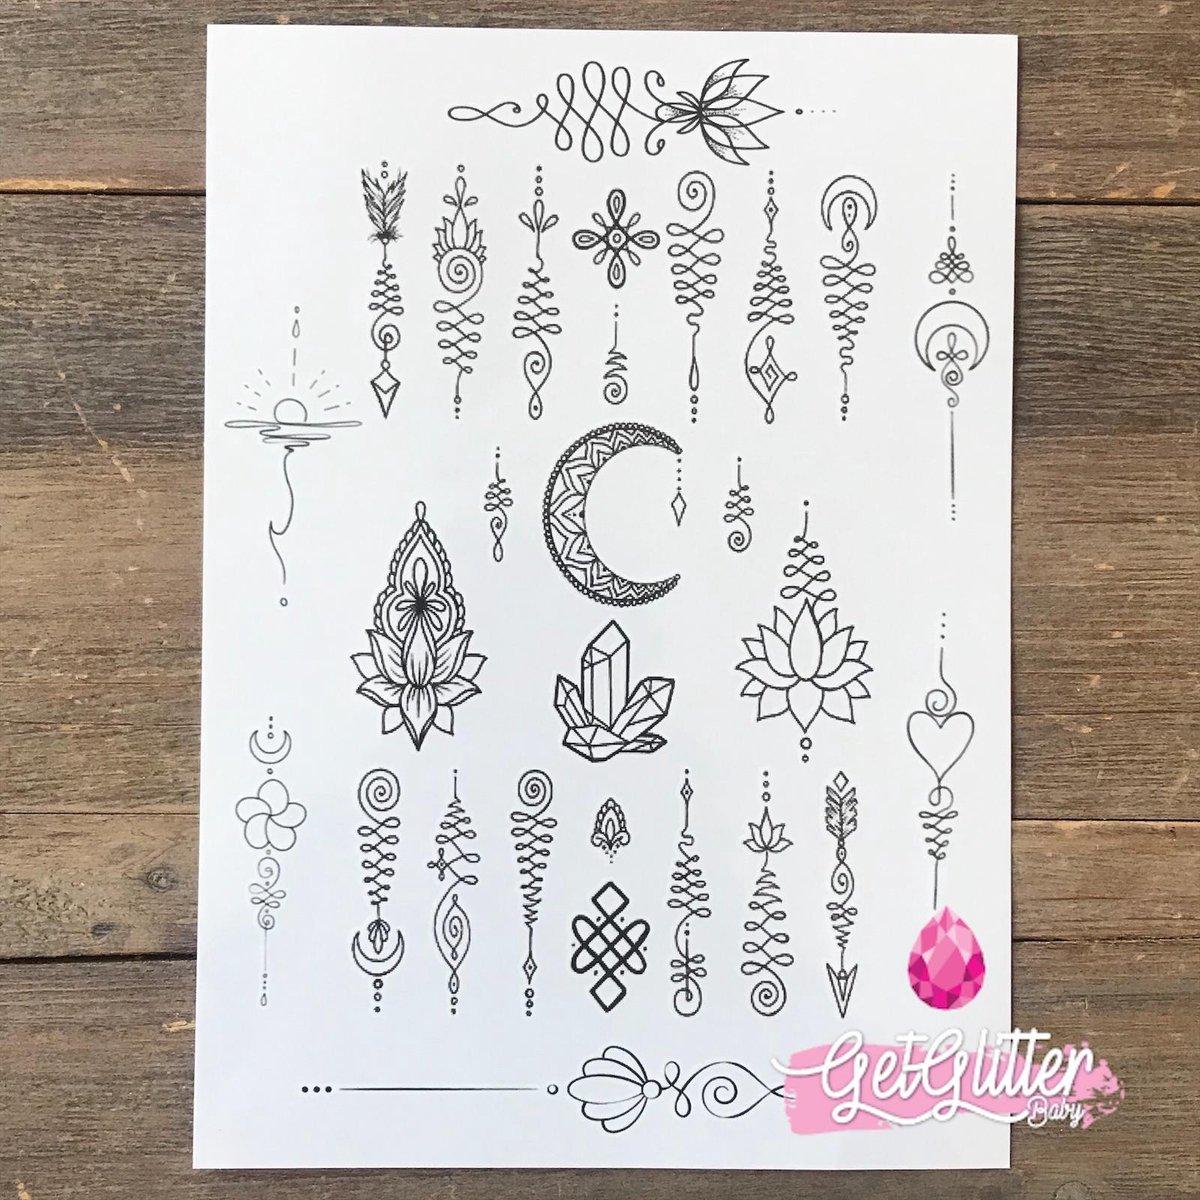 GetGlitterBaby - Henna Plak Tattoos / Tijdelijke Tattoo / Nep Tatoeage - Unalome